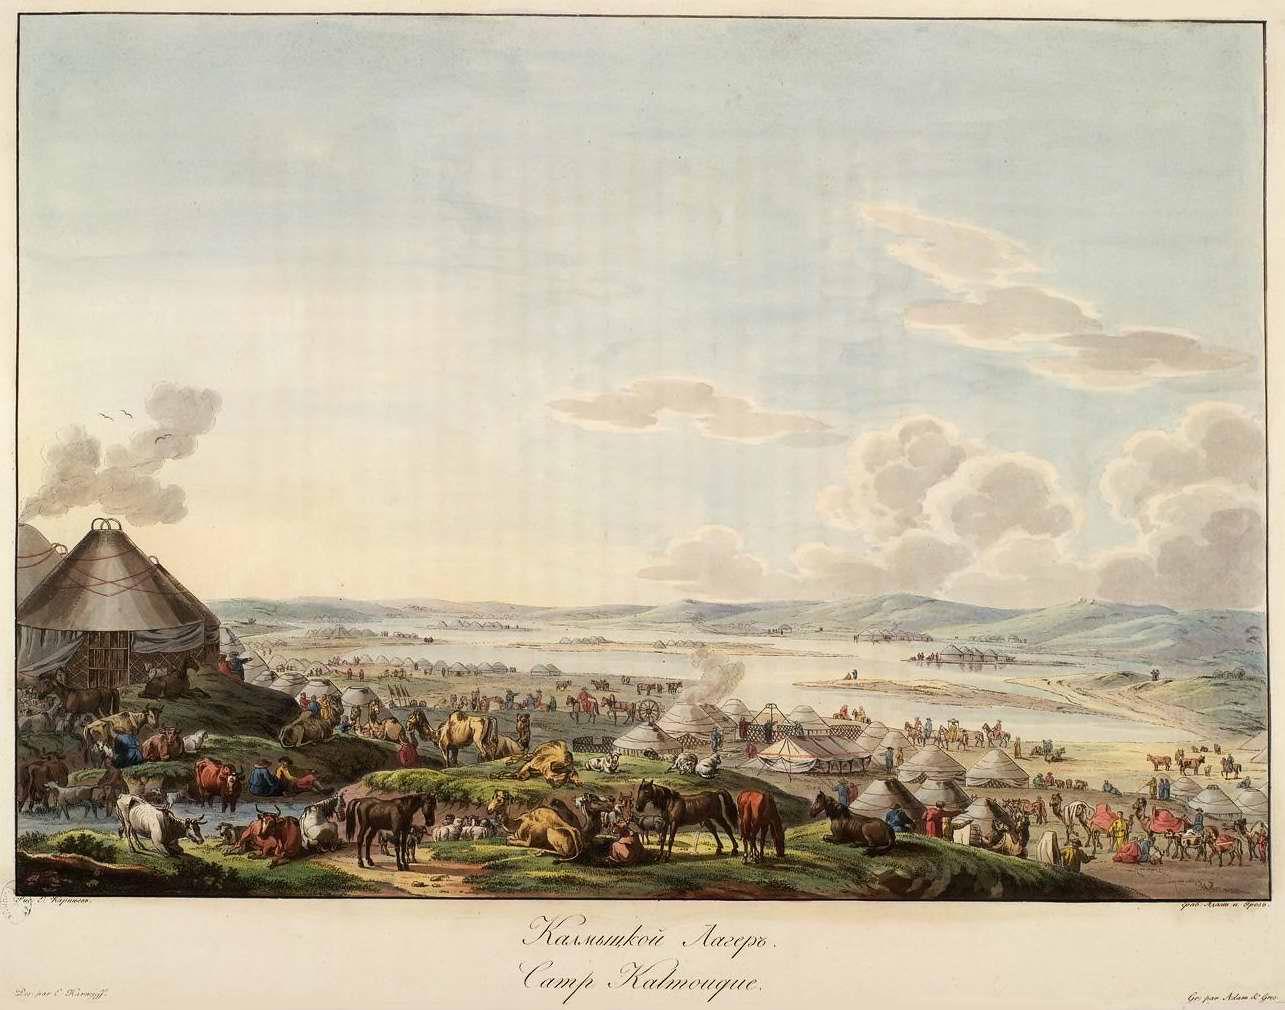 Калмыцкий лагерь (1800)